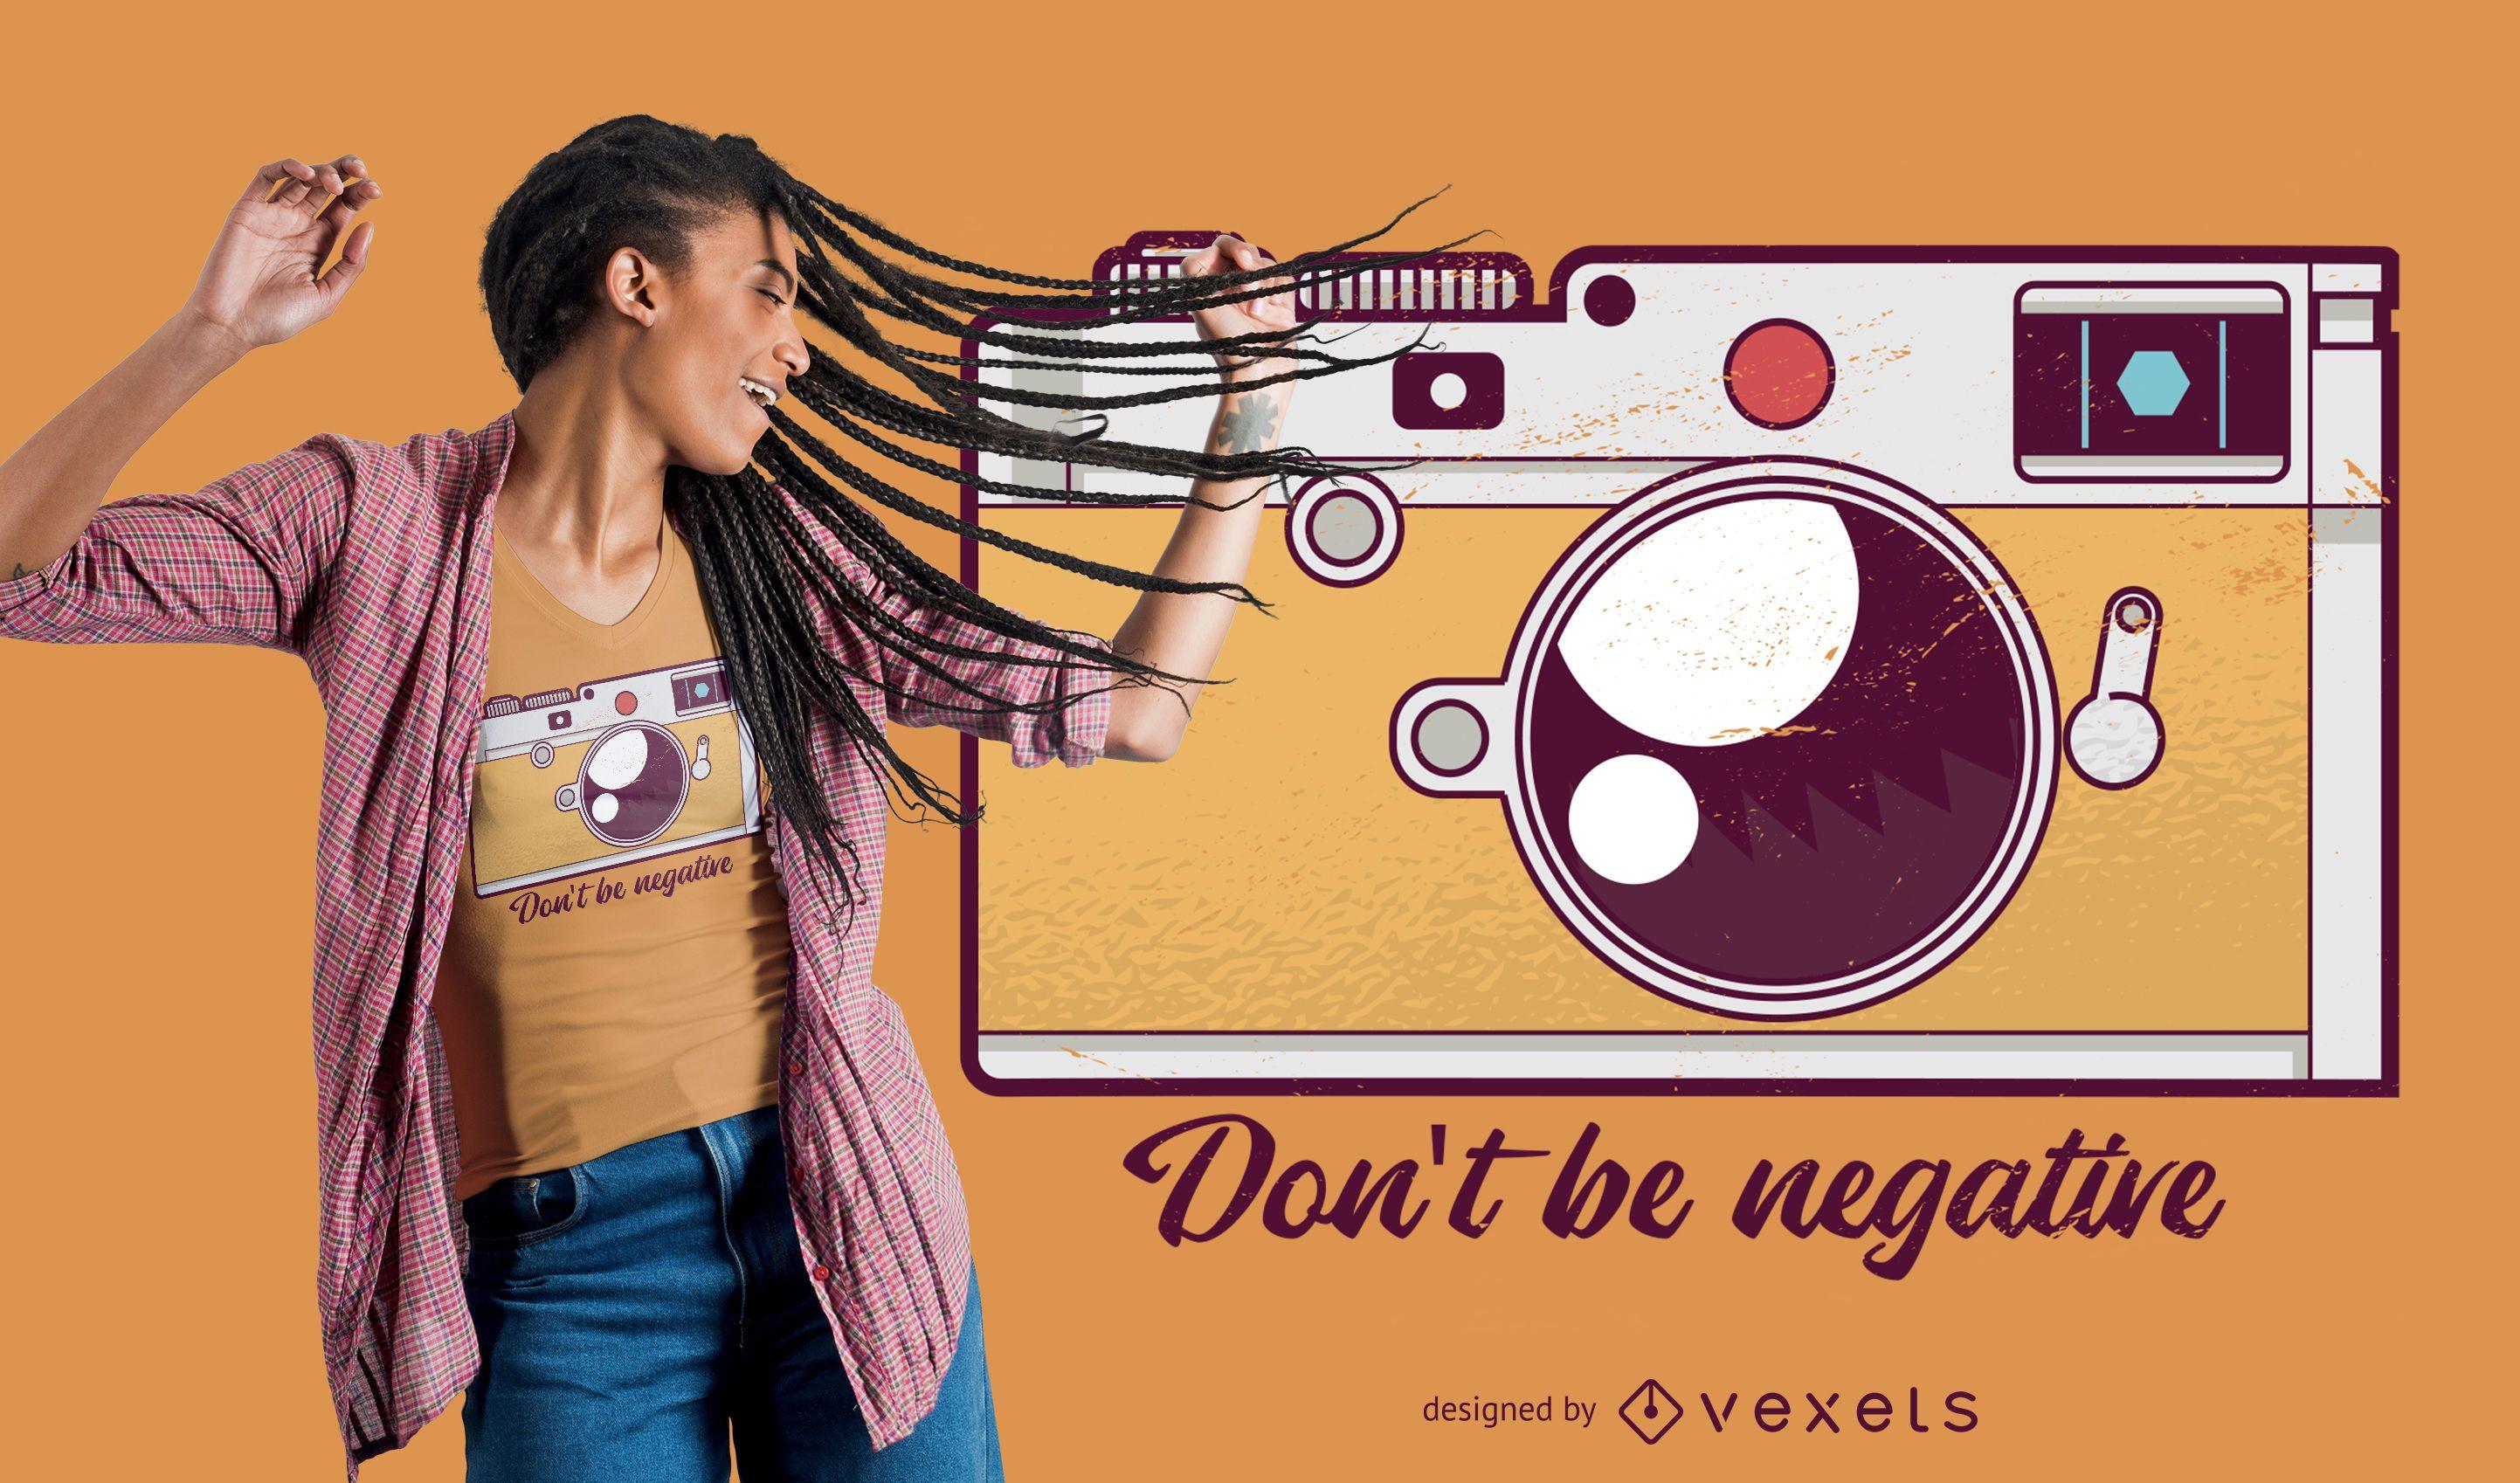 Negative t-shirt design